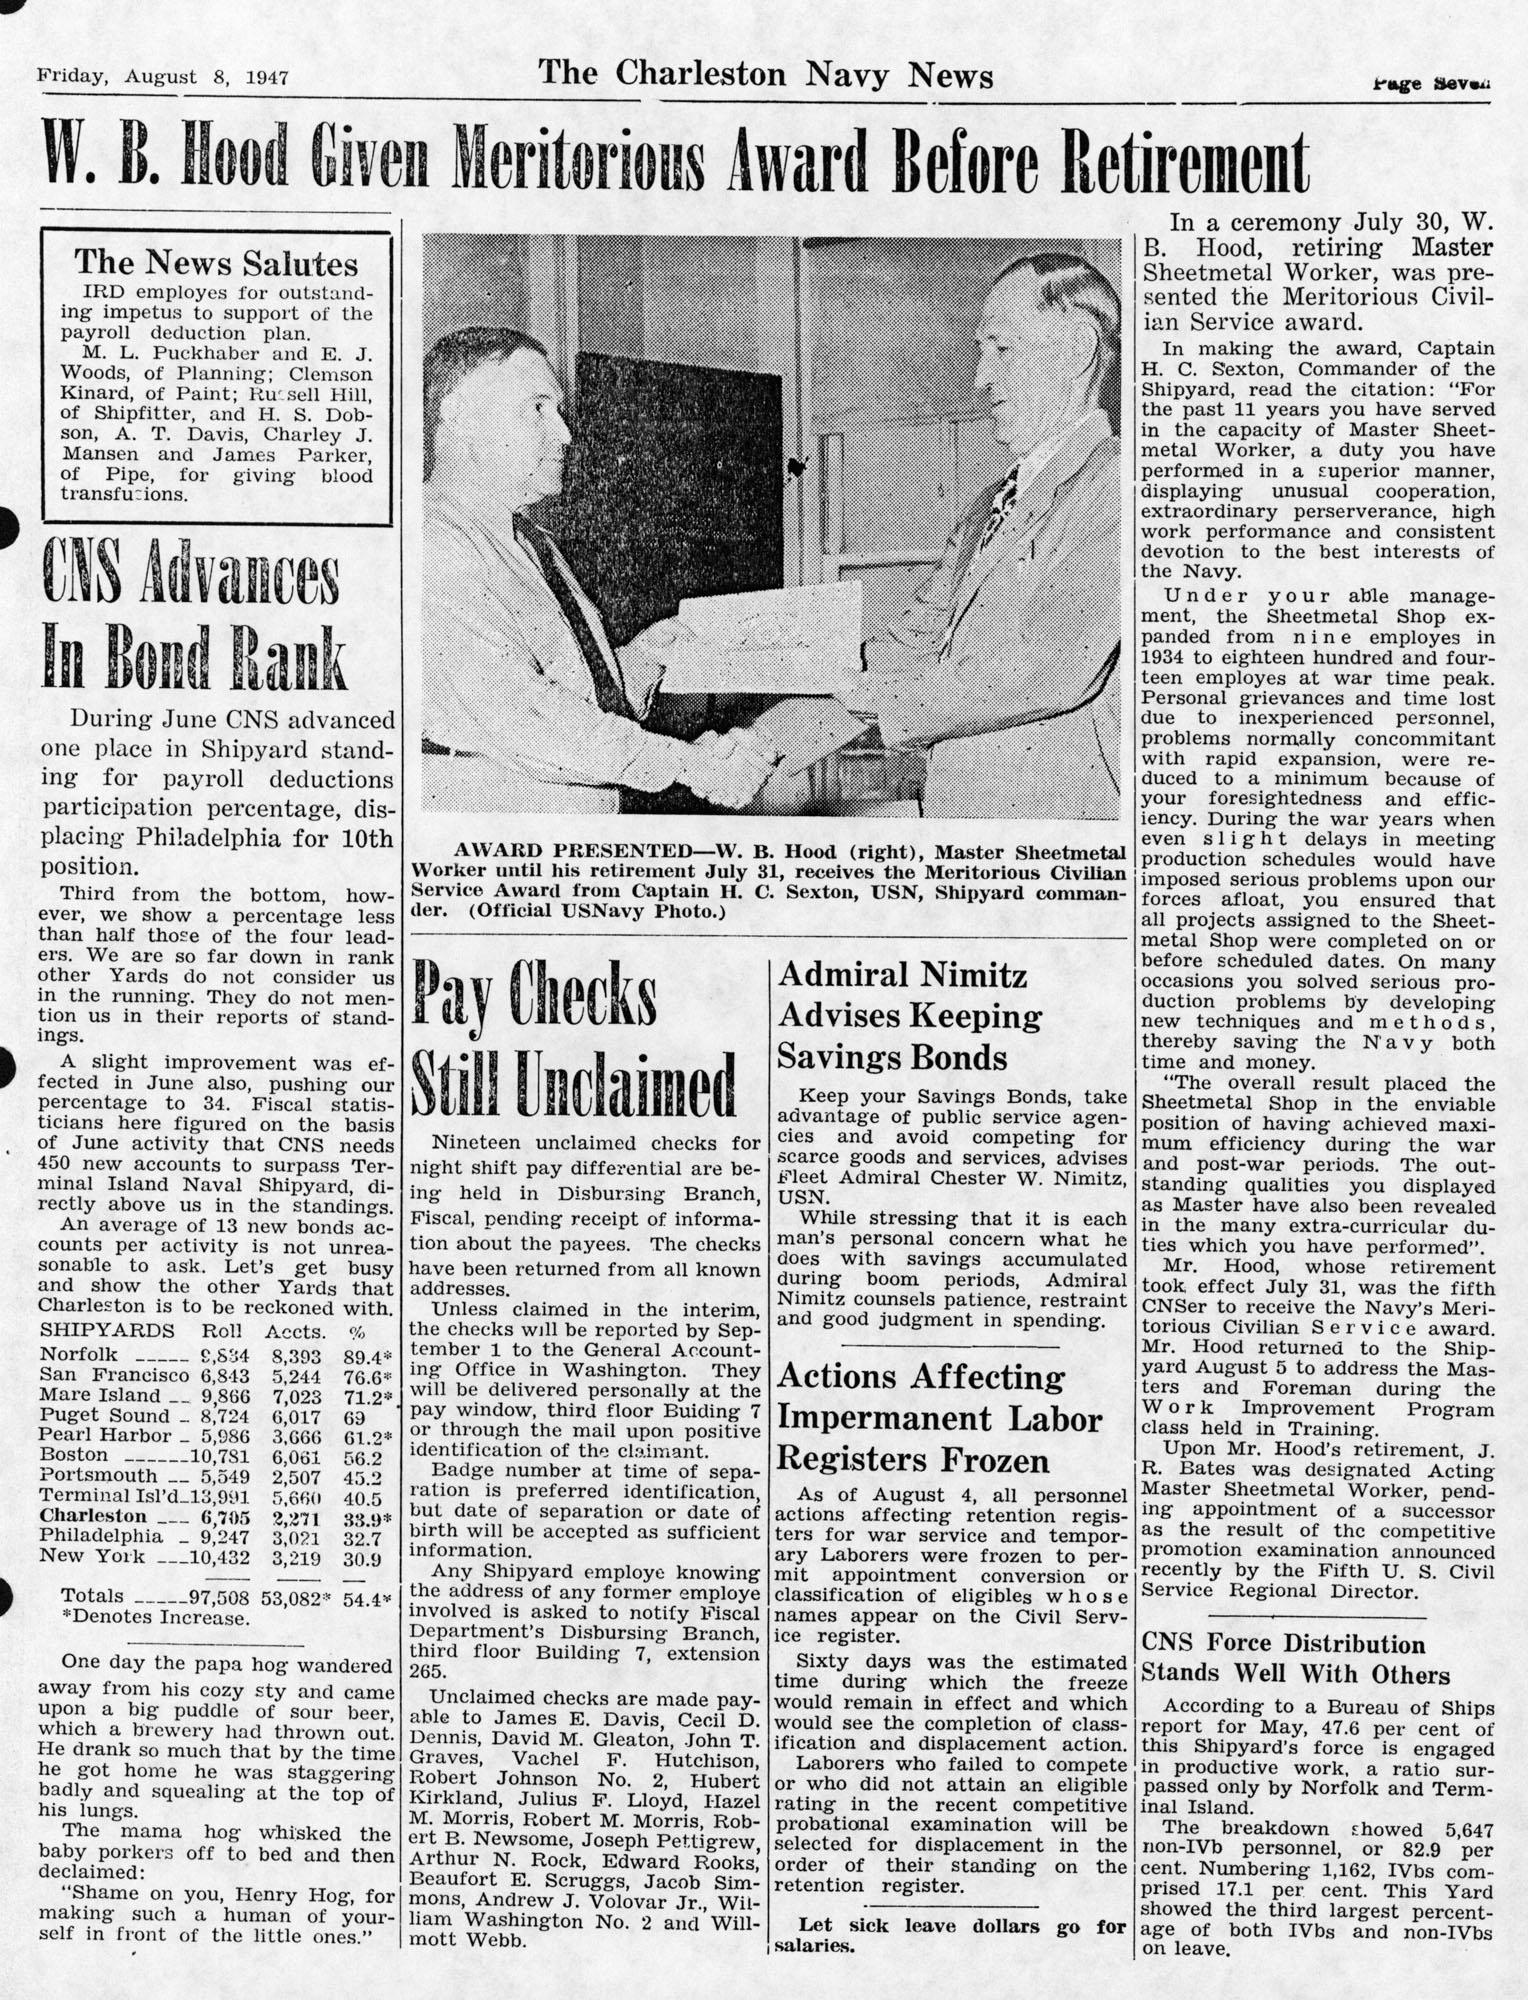 The Charleston Navy News, Volume 6, Edition 1, page vii